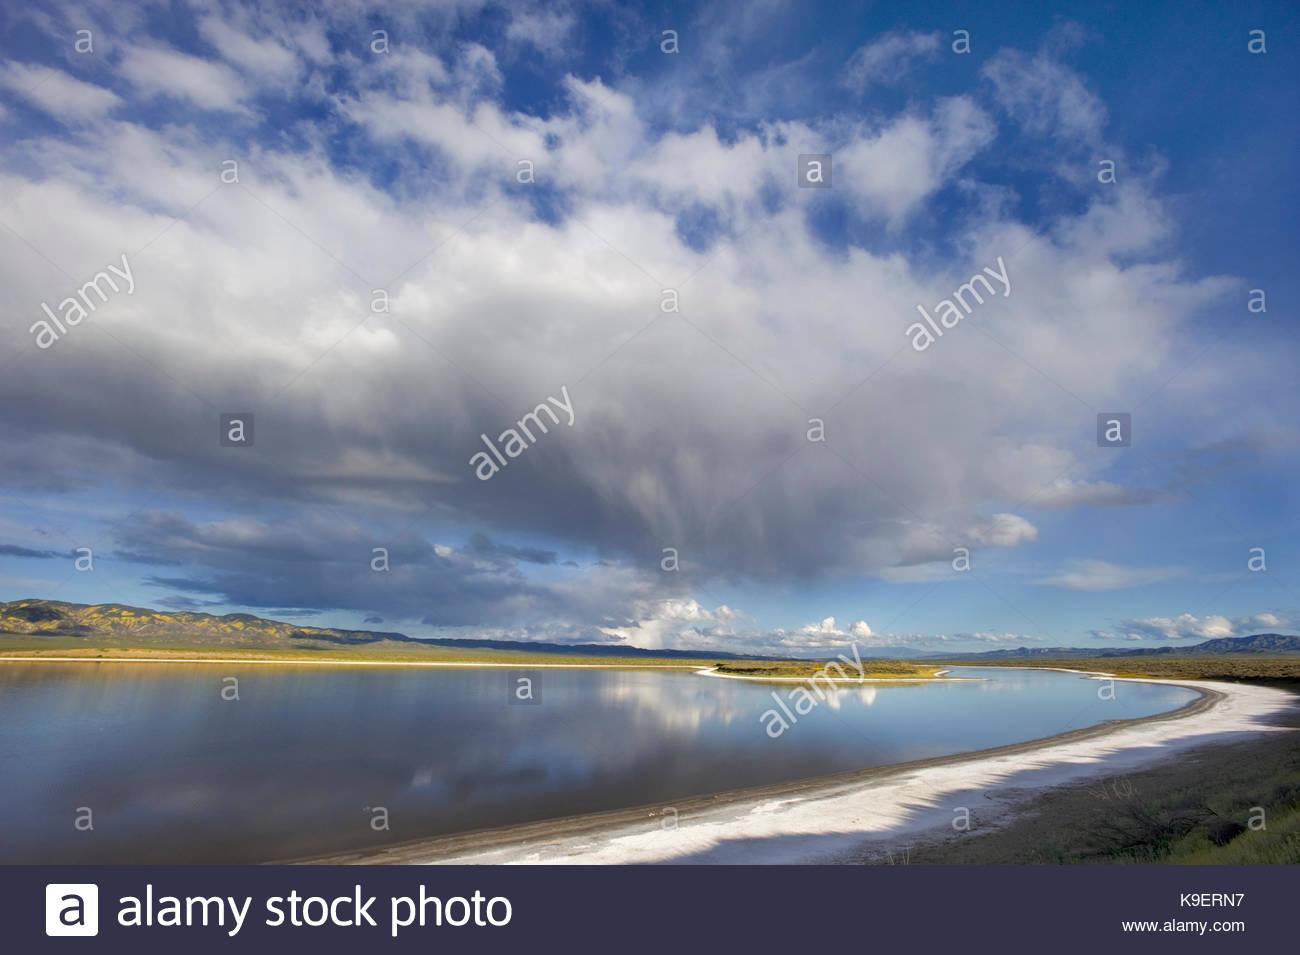 Rain Cloud over Soda Lake,Carrizo Plain National Monument, California - Stock Image